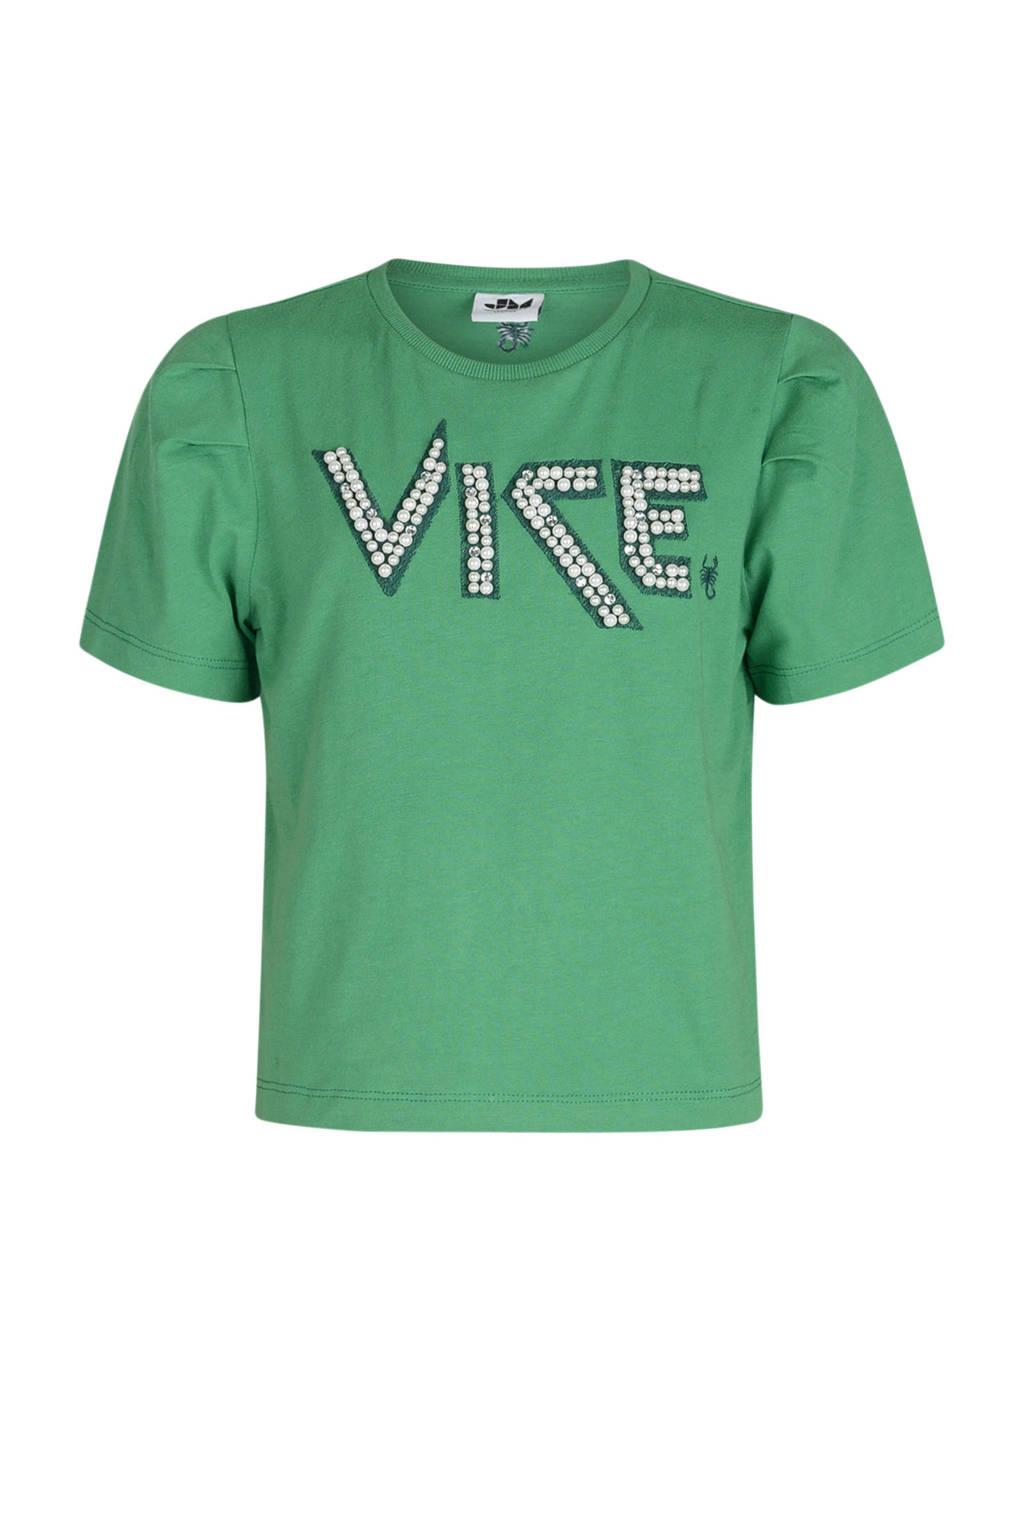 Jill & Mitch by Shoeby T-shirt Gammie met tekst groen, Groen